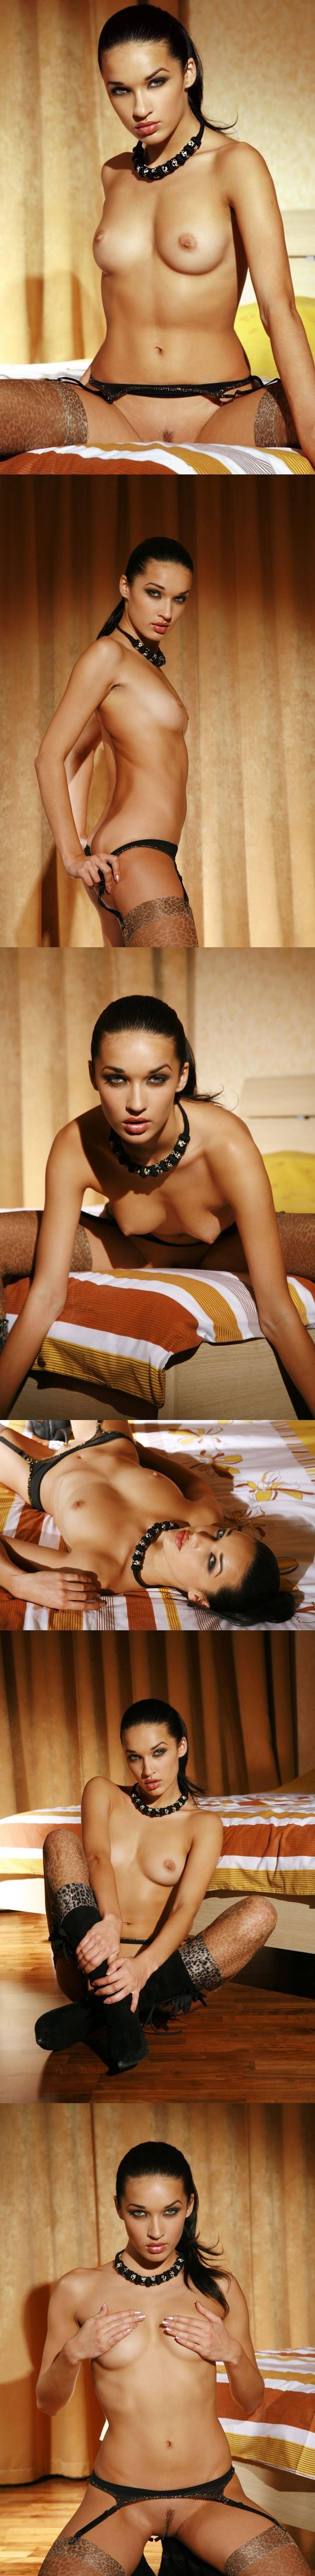 MA_20080723_-_Felicity_A_-_Presenting_-_by_Nicolas_Grier.zip-jk- Met-Art MA 20080723 - Olga M - Suggestioni - by Alexander Voronin